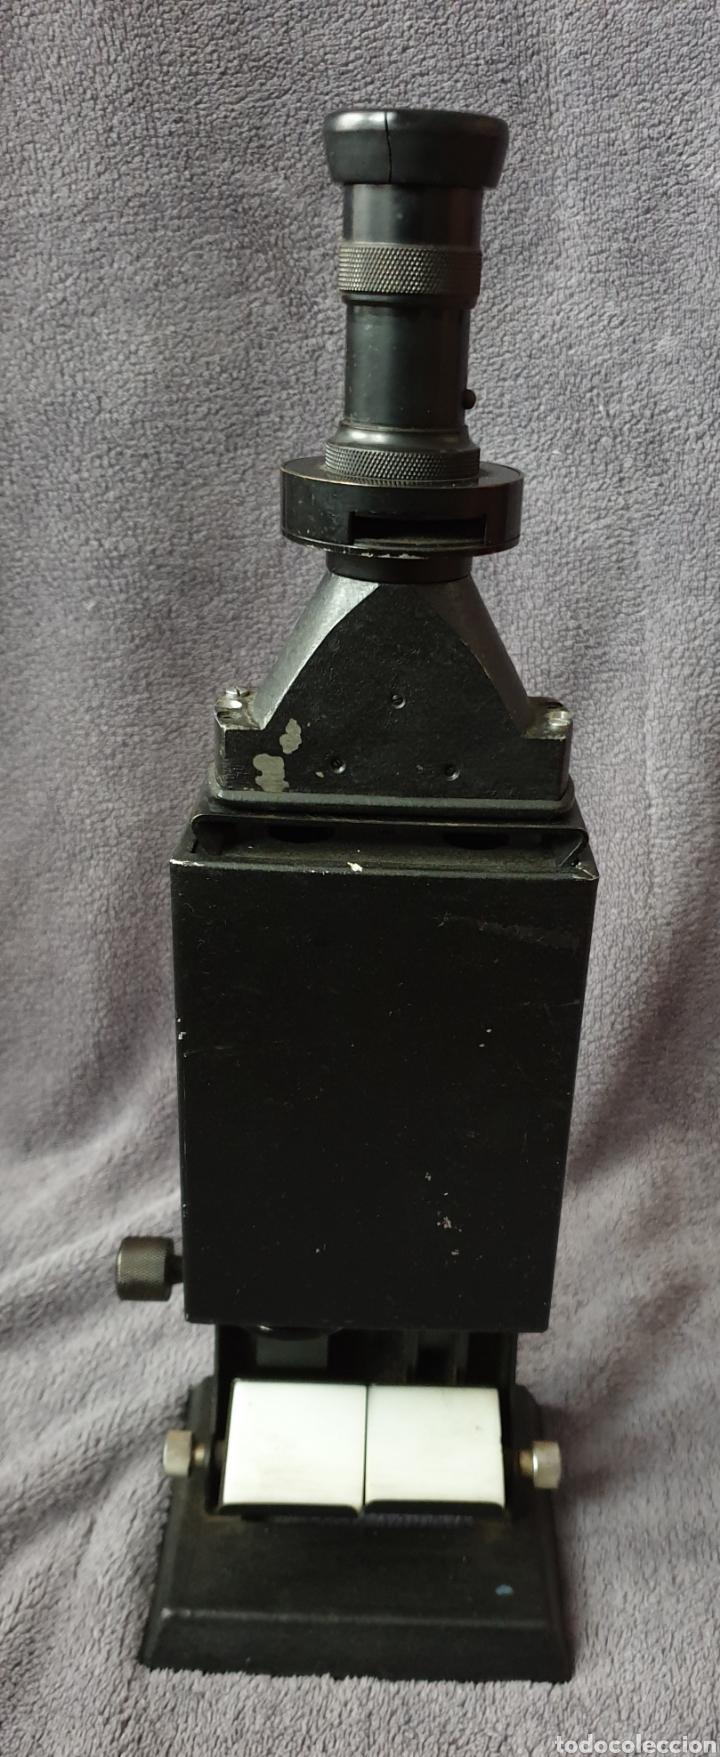 Antigüedades: Colorimetro antiguo F.Hellige & Co. - Foto 3 - 192215237